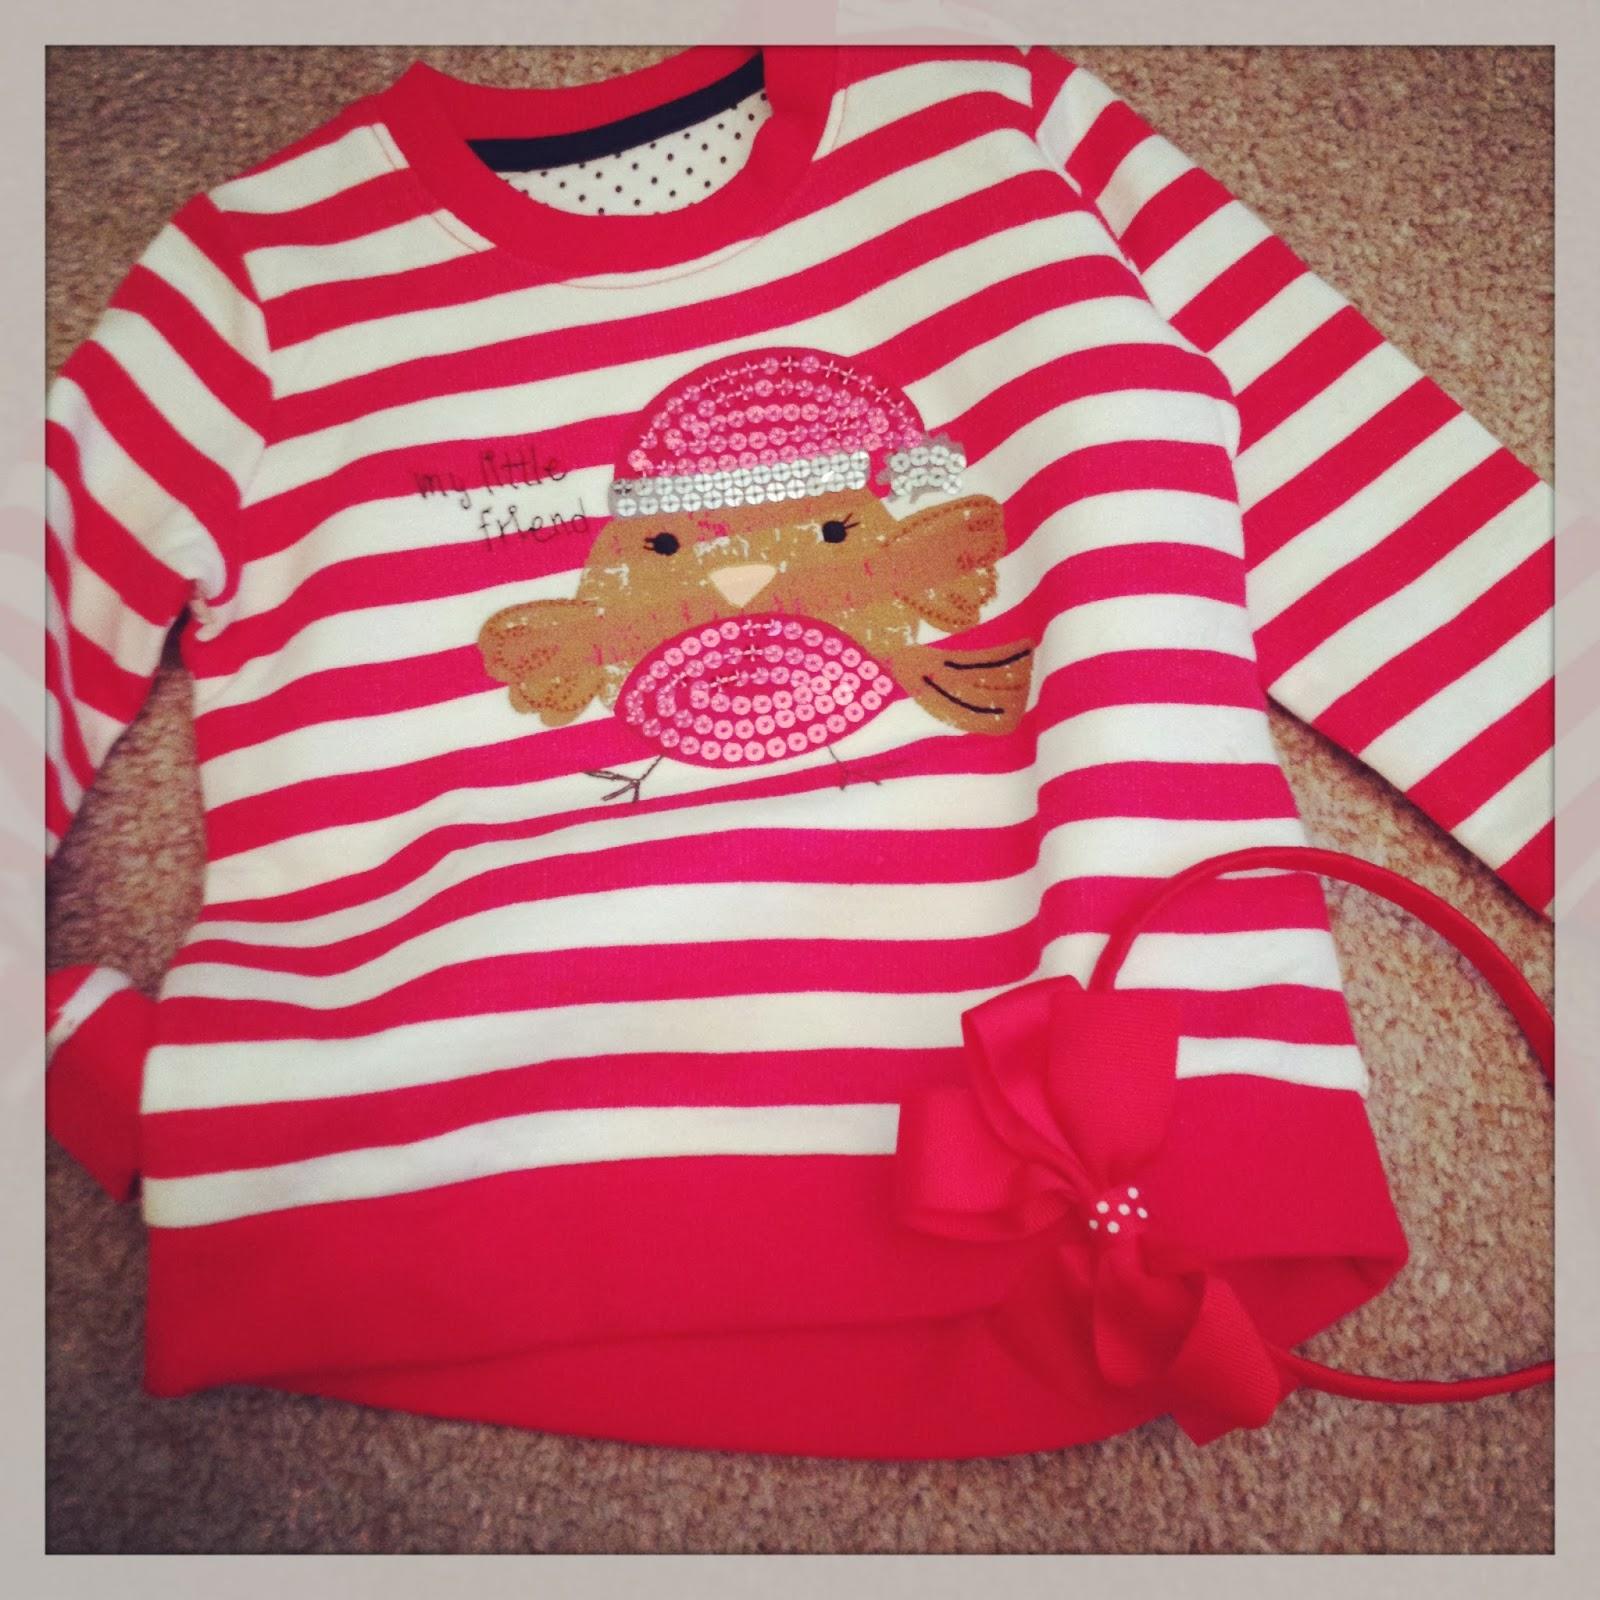 mamasVIB   V. I. BUY: Last minute Christmas buy… from Matalan!, V. I. BABY   Last minute buys   stripe jumper   christmas jumper   kids fashion   mamasVIB